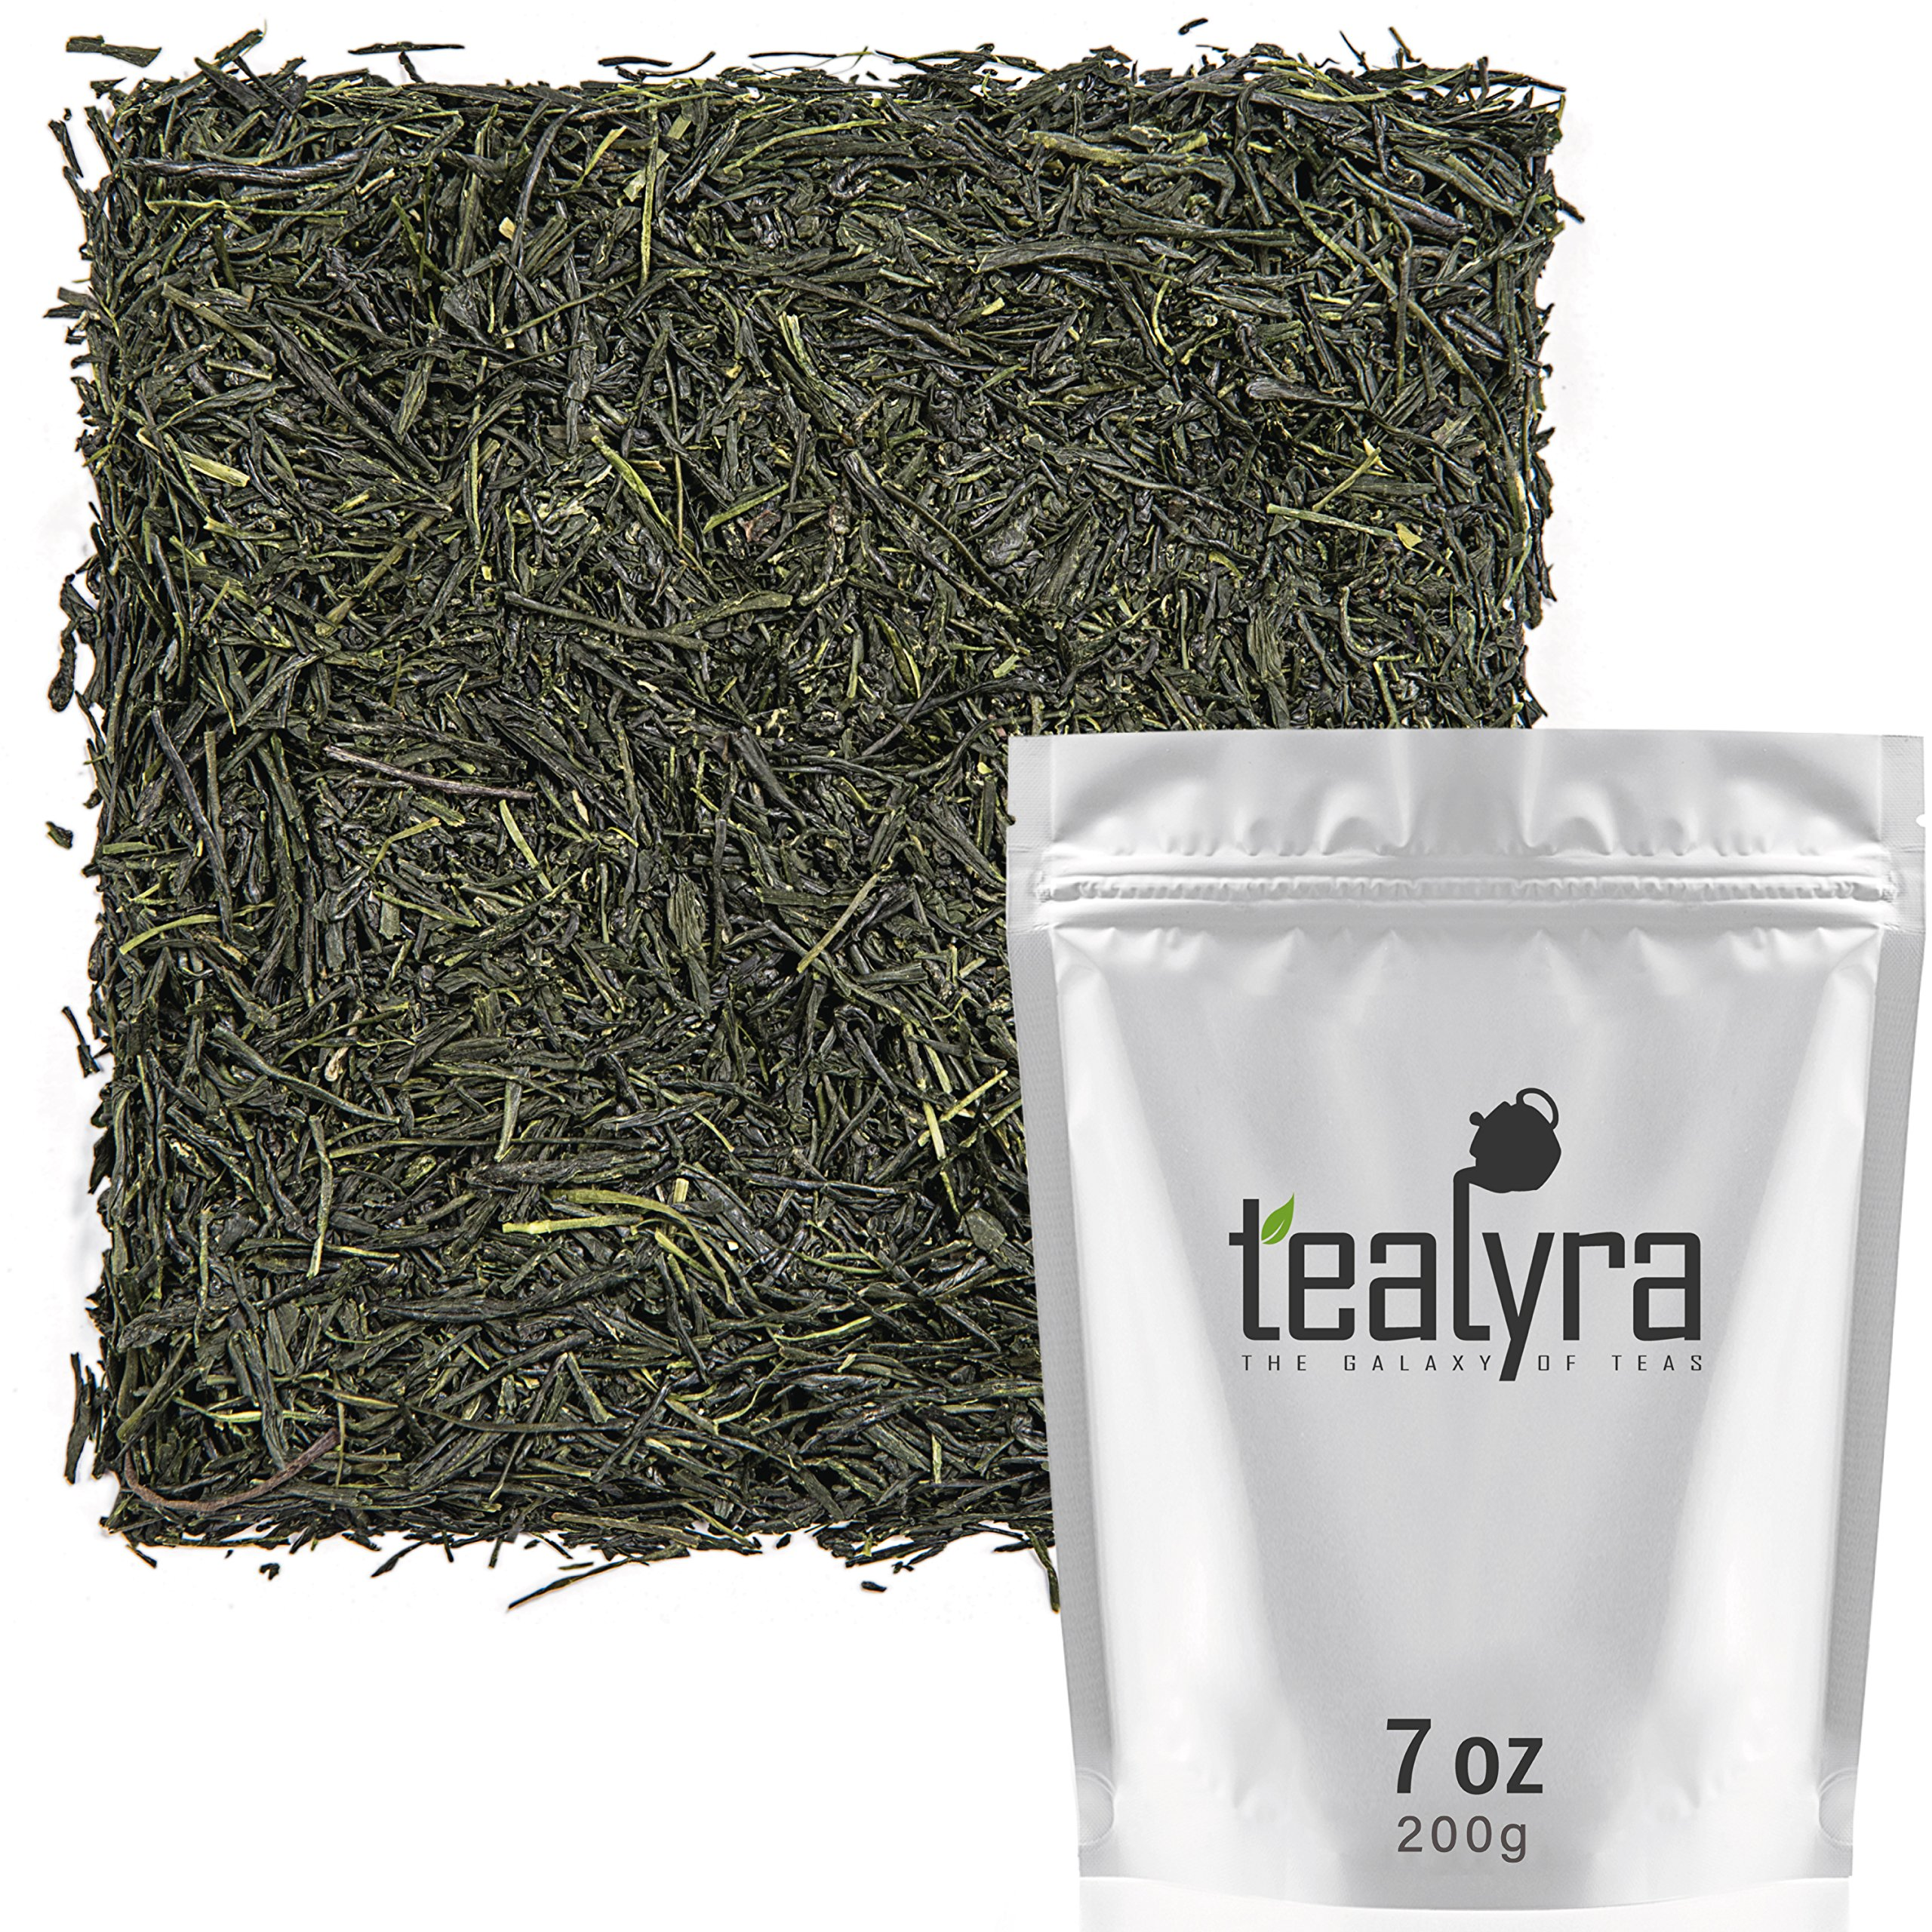 Tealyra - Handmade Premium 1st Flush - Gyokuro Green Tea - Organically Grown in Yame Japan - Loose Leaf Tea - Caffeine Medium - 200g (7-ounce)